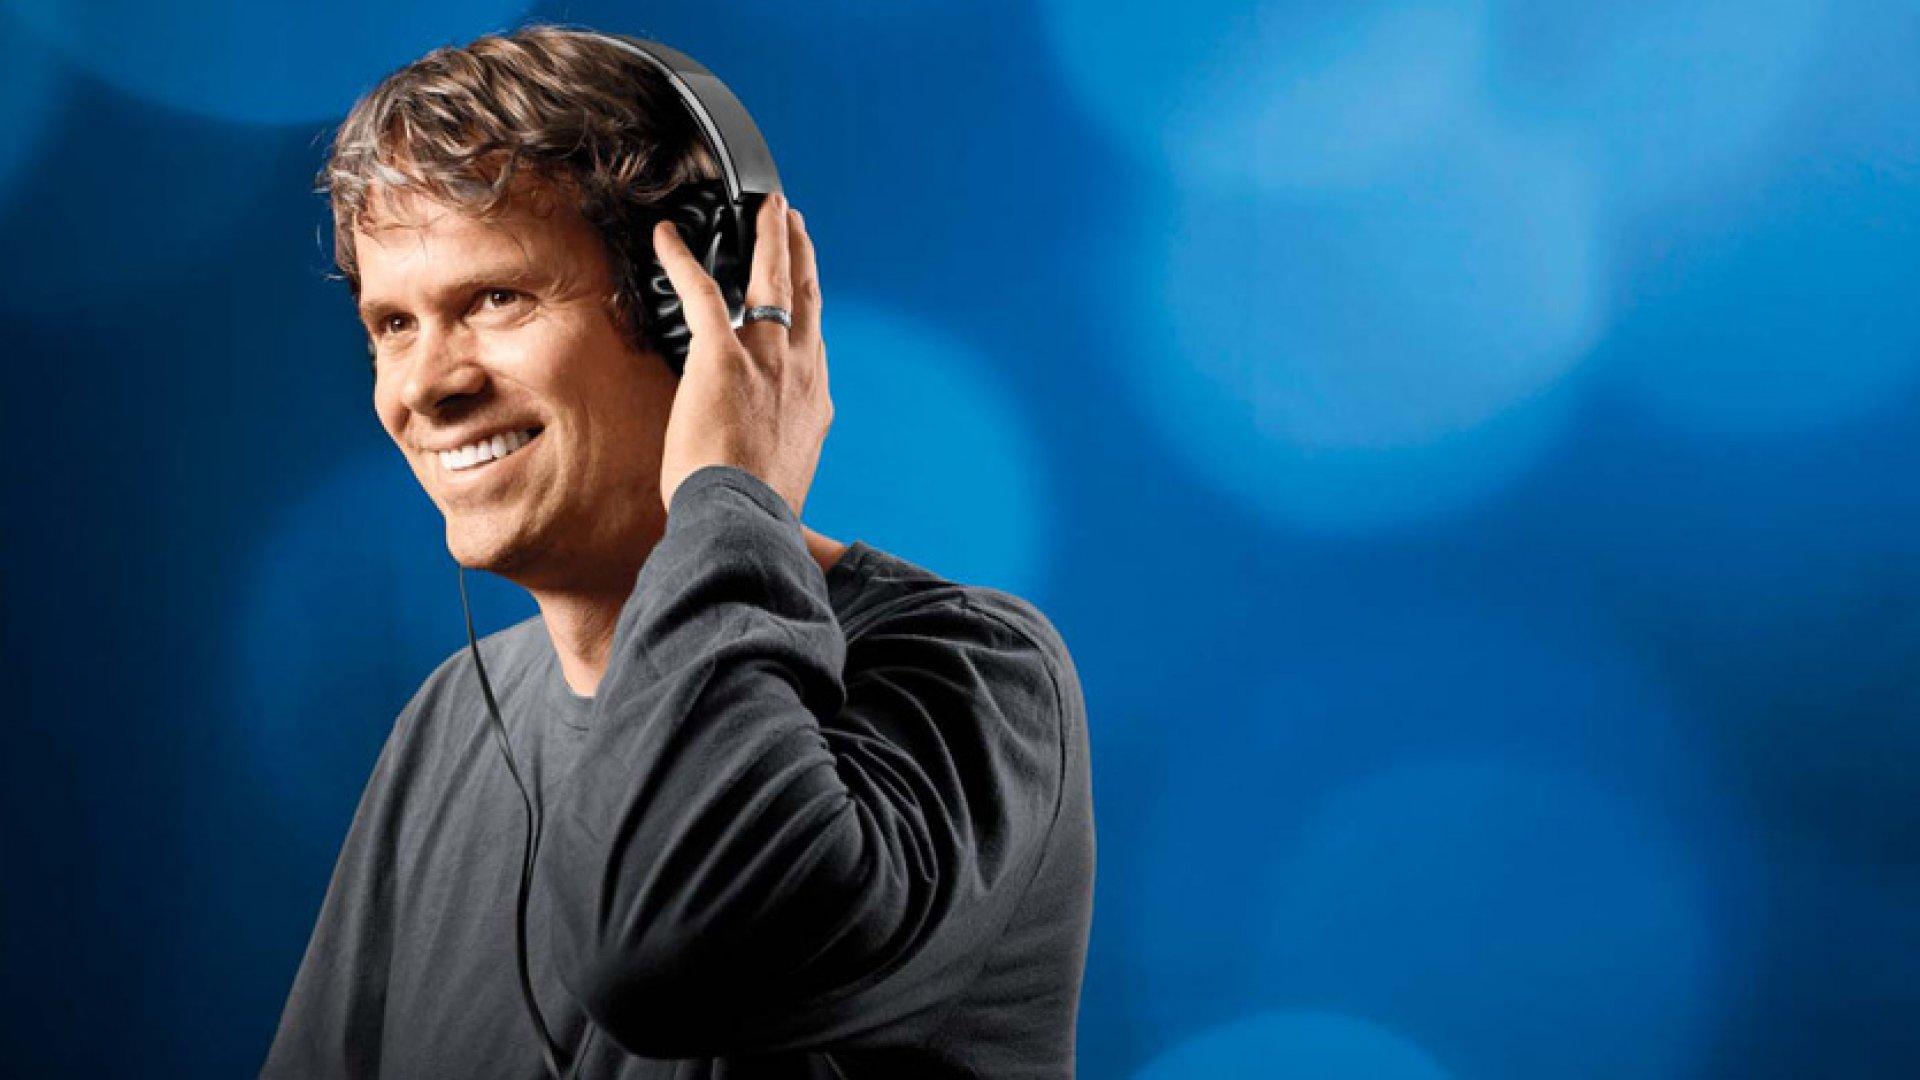 10 Questions for Pandora's Tim Westergren